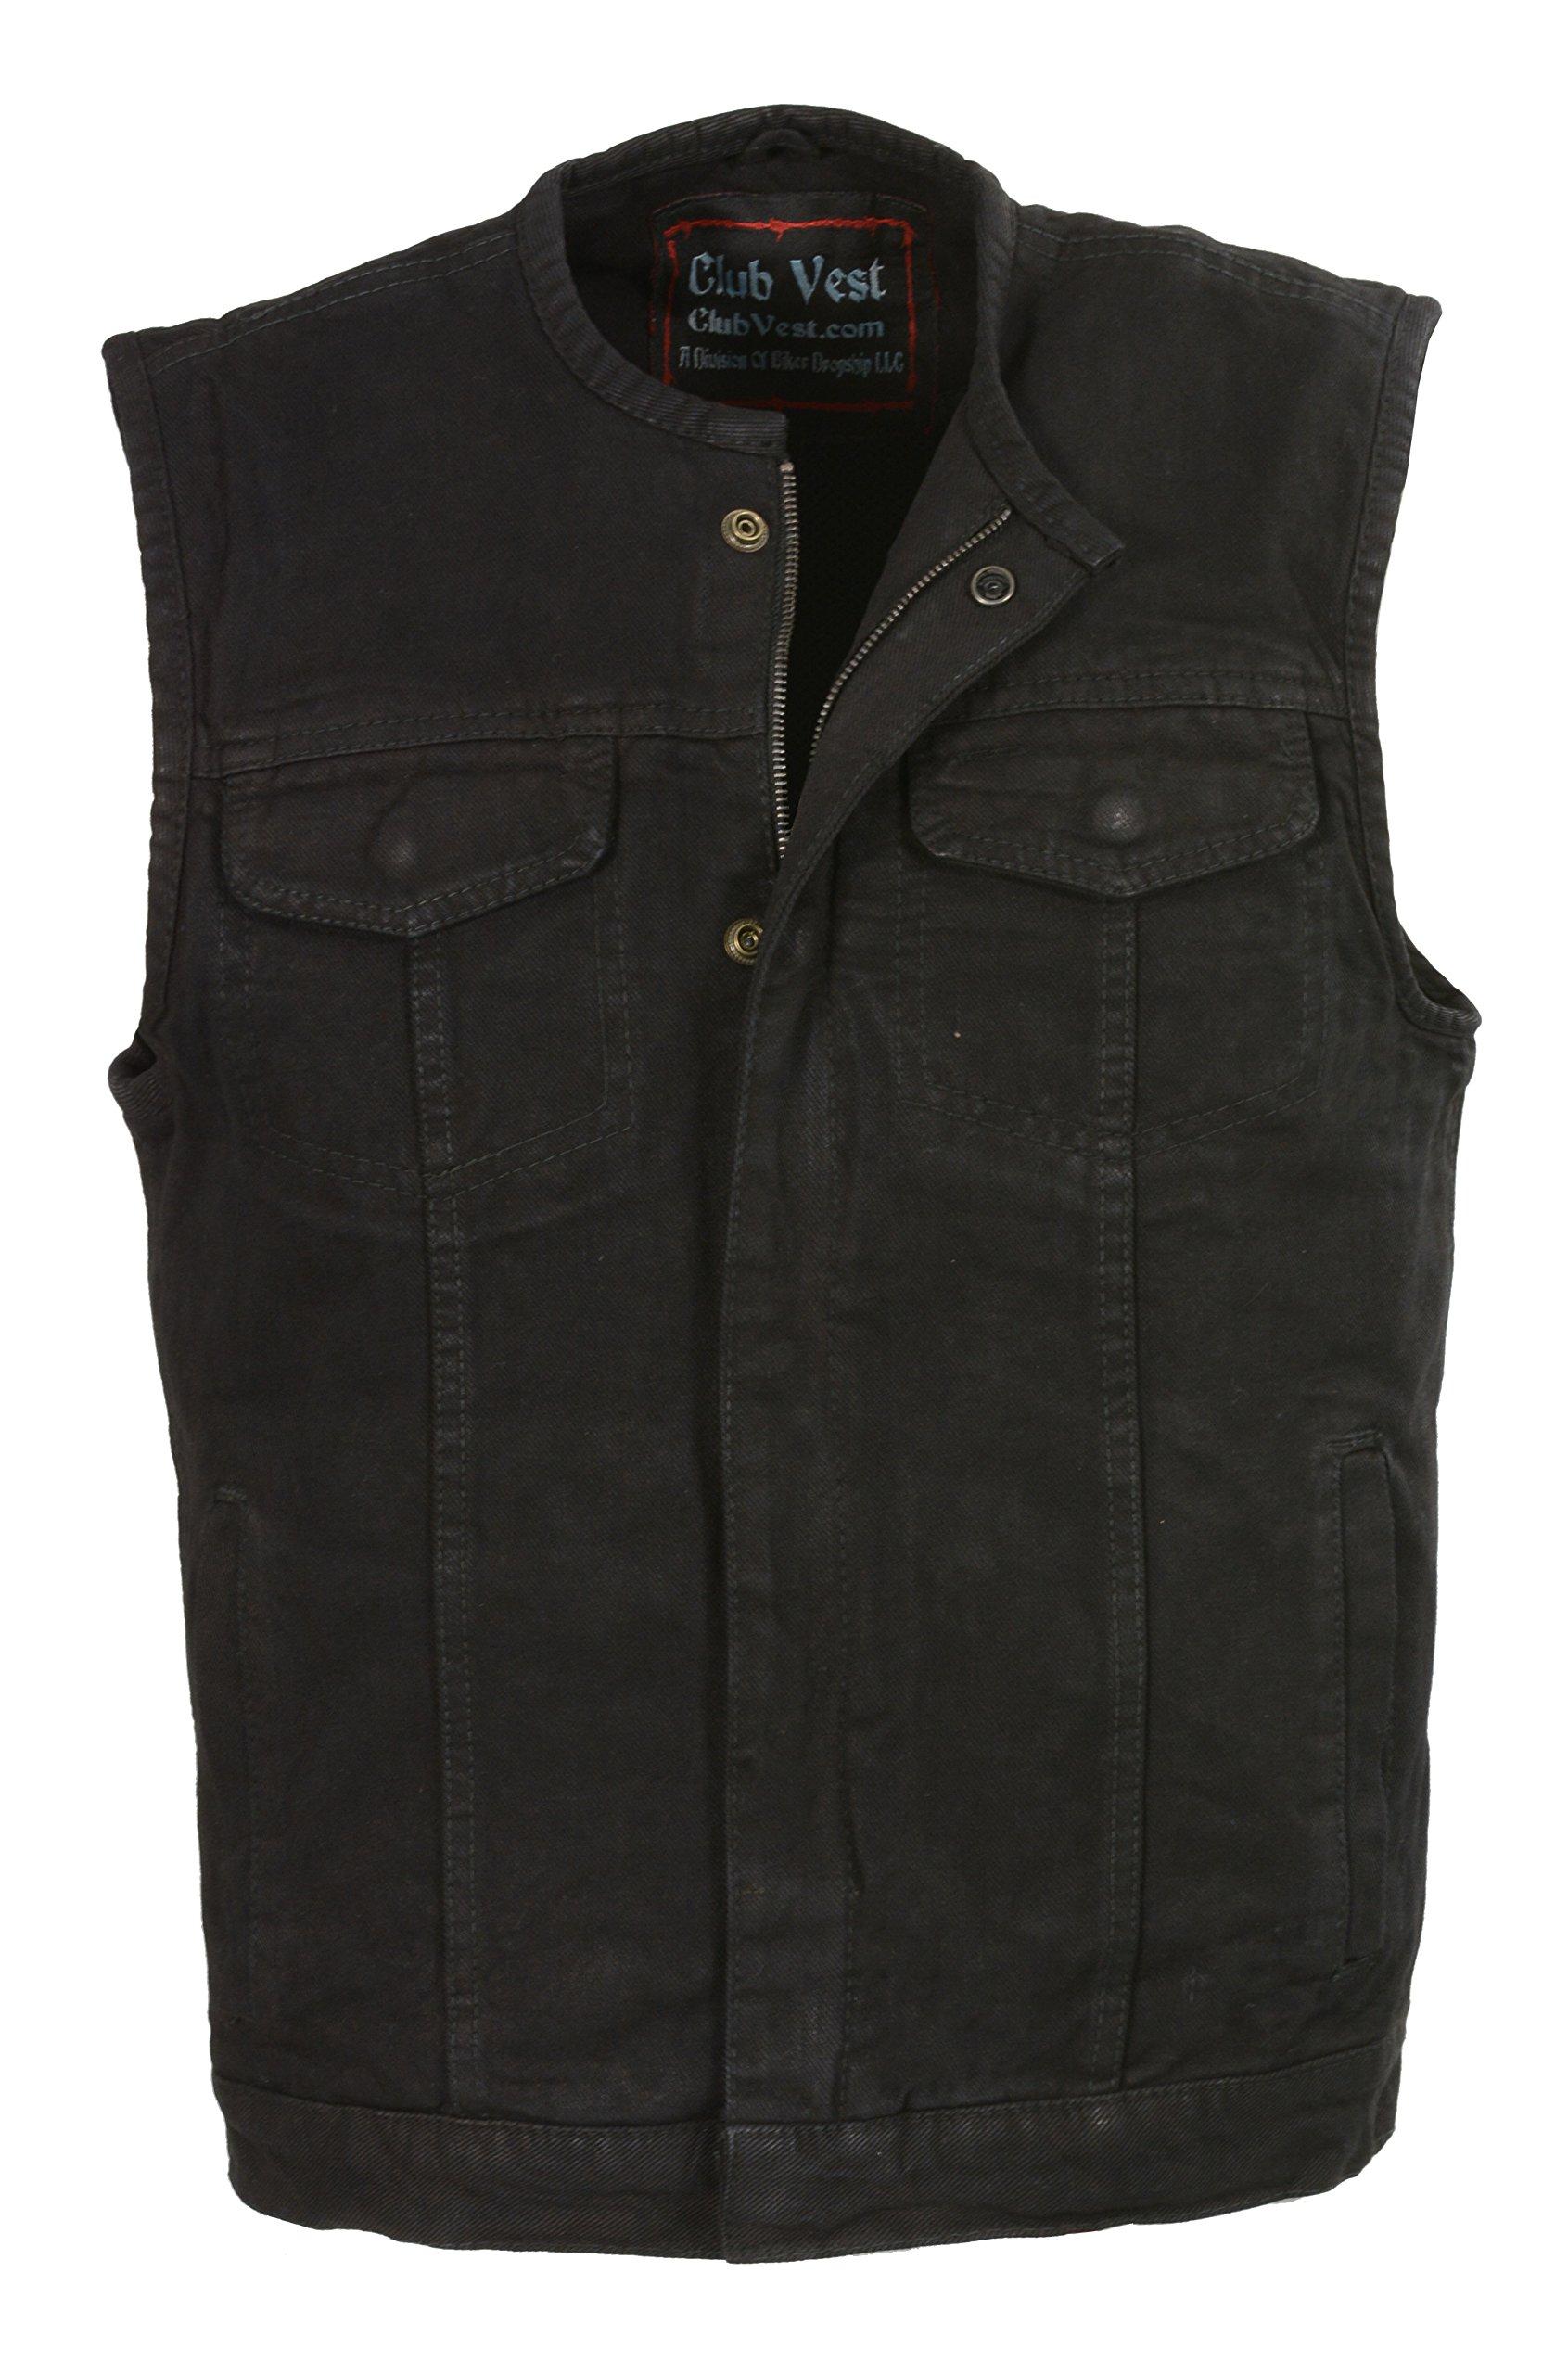 Club Vest-Men's Collarless Denim Club Vest w/Hidden Zipper (Black, MD), 1 Pack